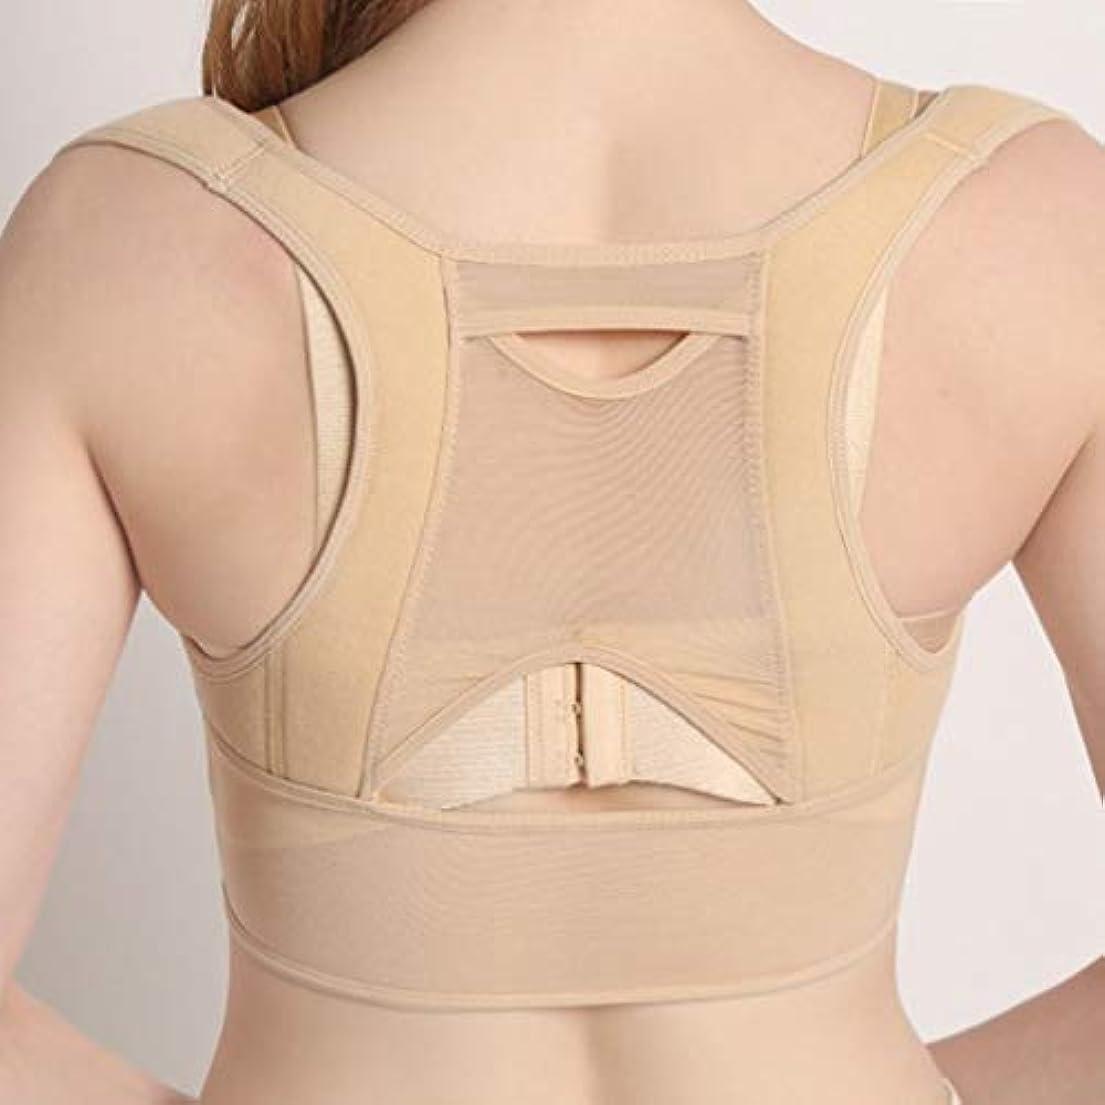 上昇色動背部姿勢補正コルセット上背部肩背骨姿勢補正器背部姿勢、補正コルセット、整形外科、上背部、肩背骨、姿勢補正器ベージュホワイトM